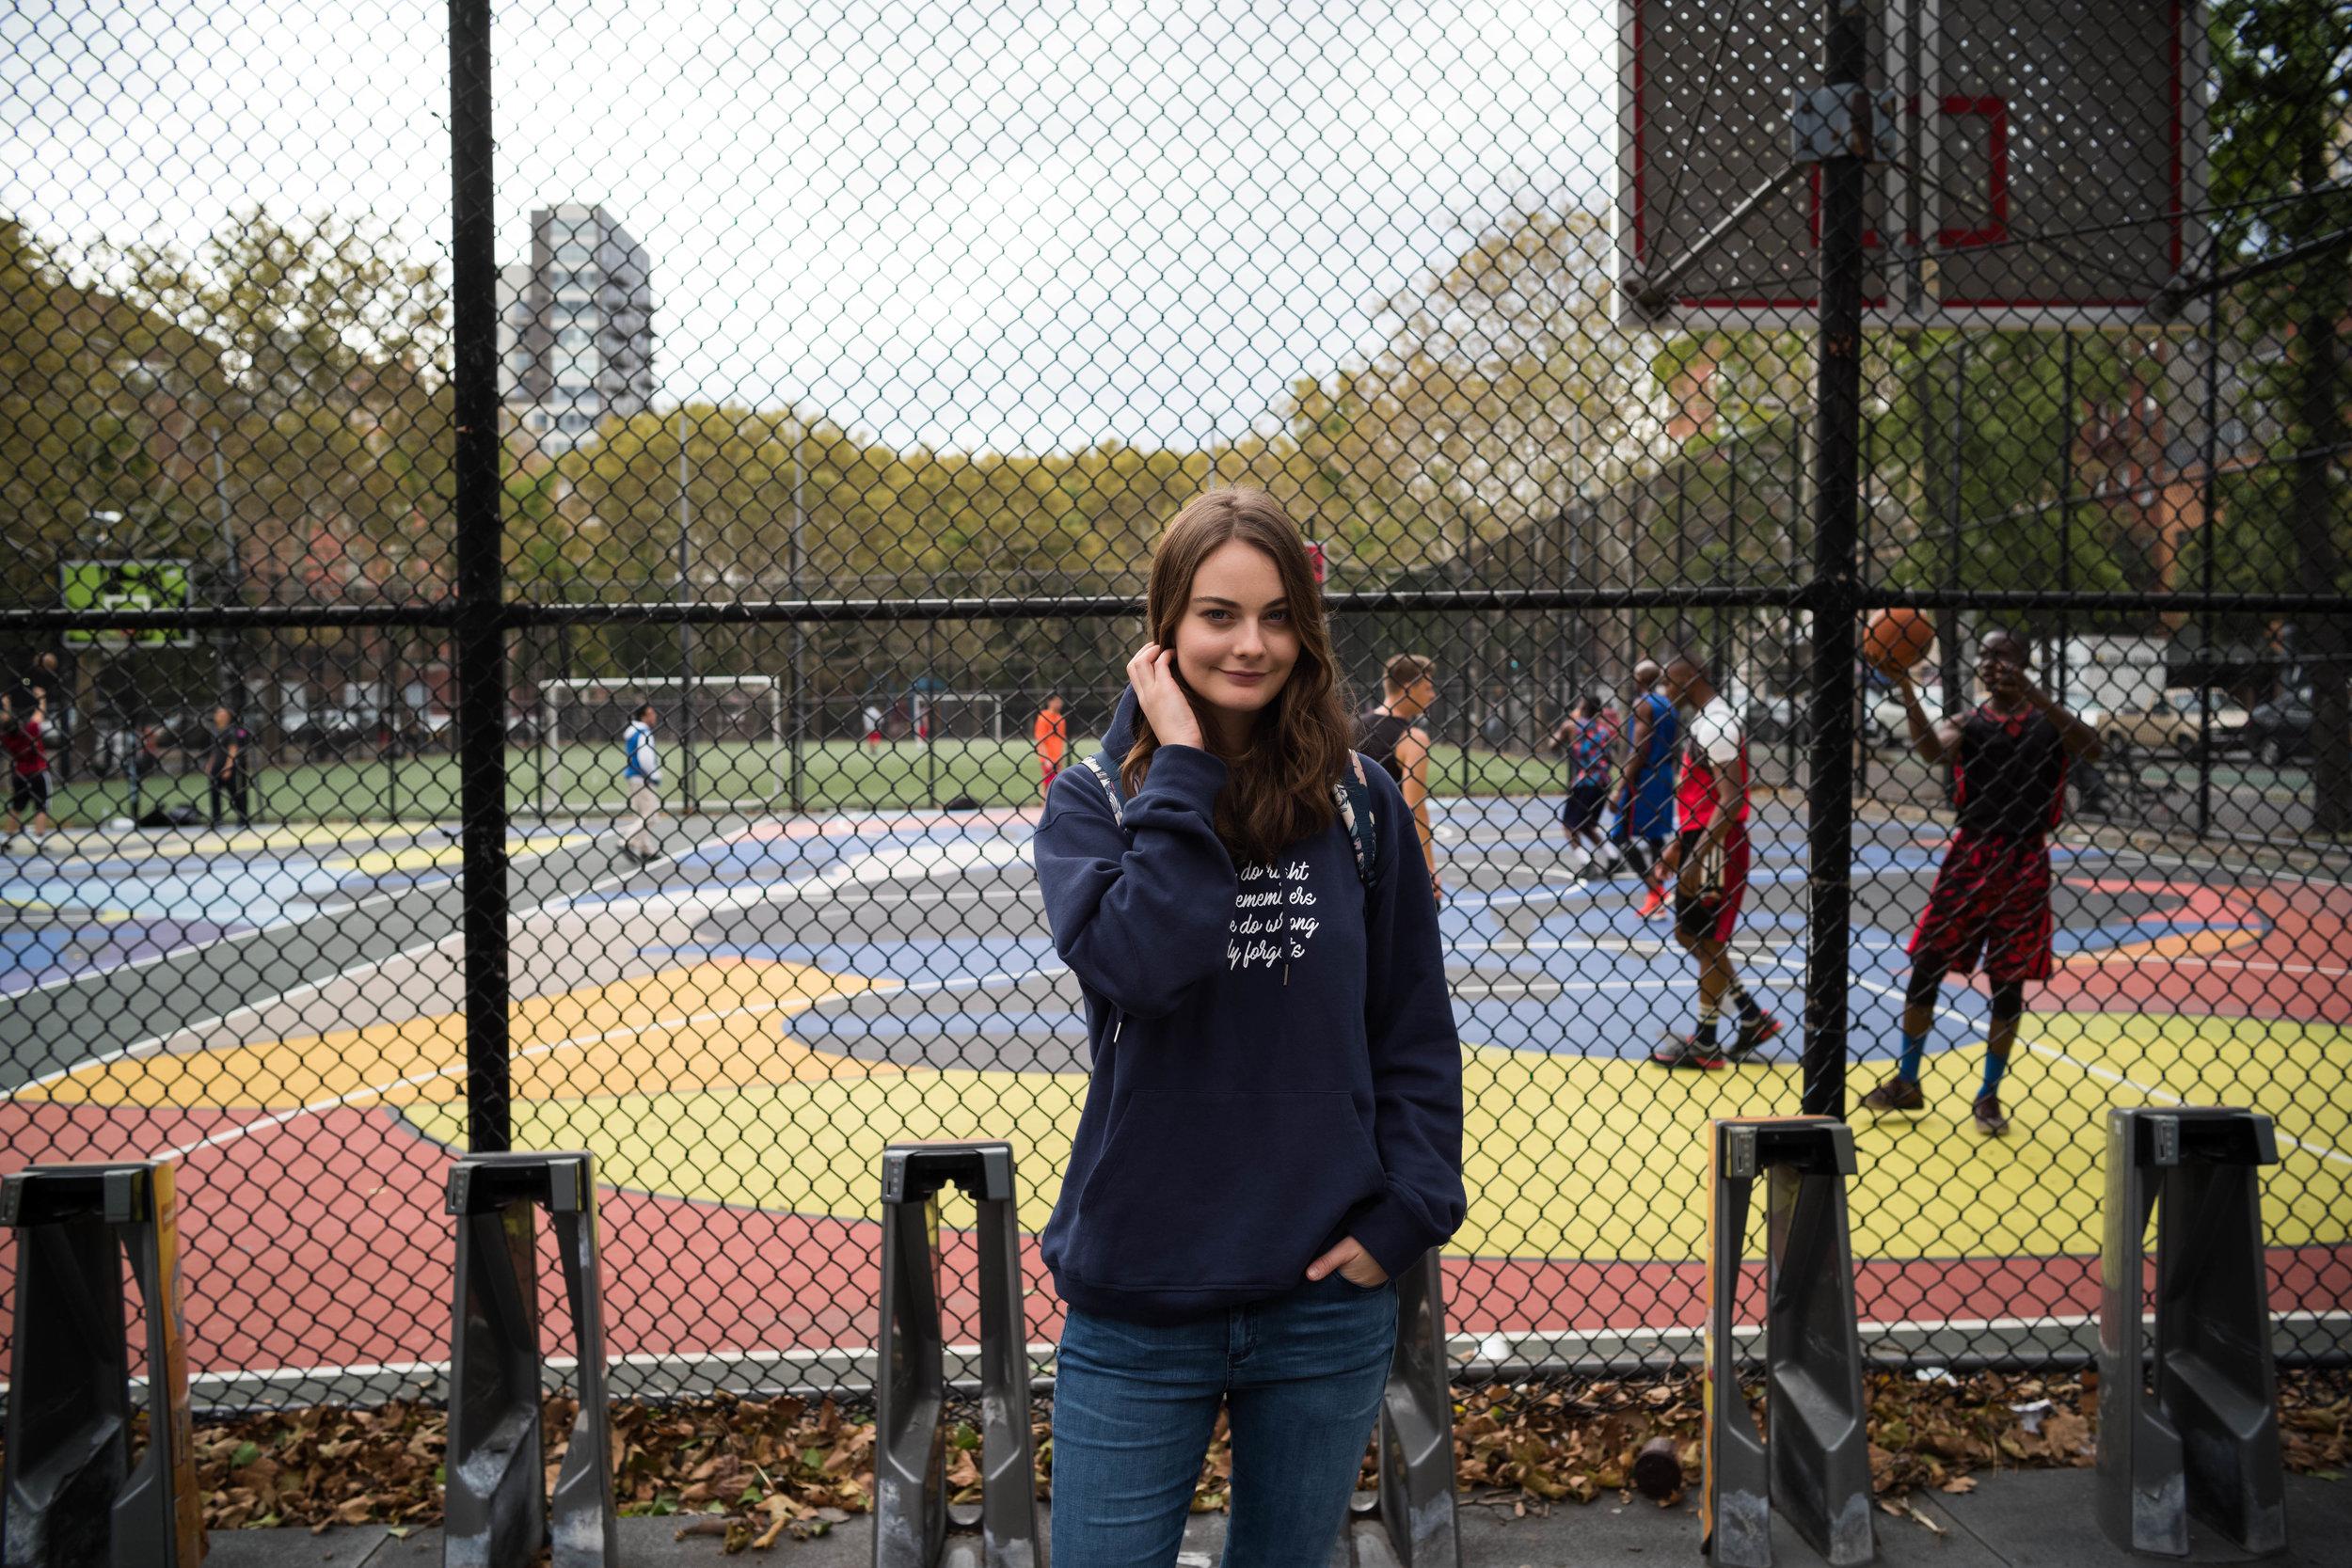 Outside a neighborhood pickup basketball game, on the Lower East Side.